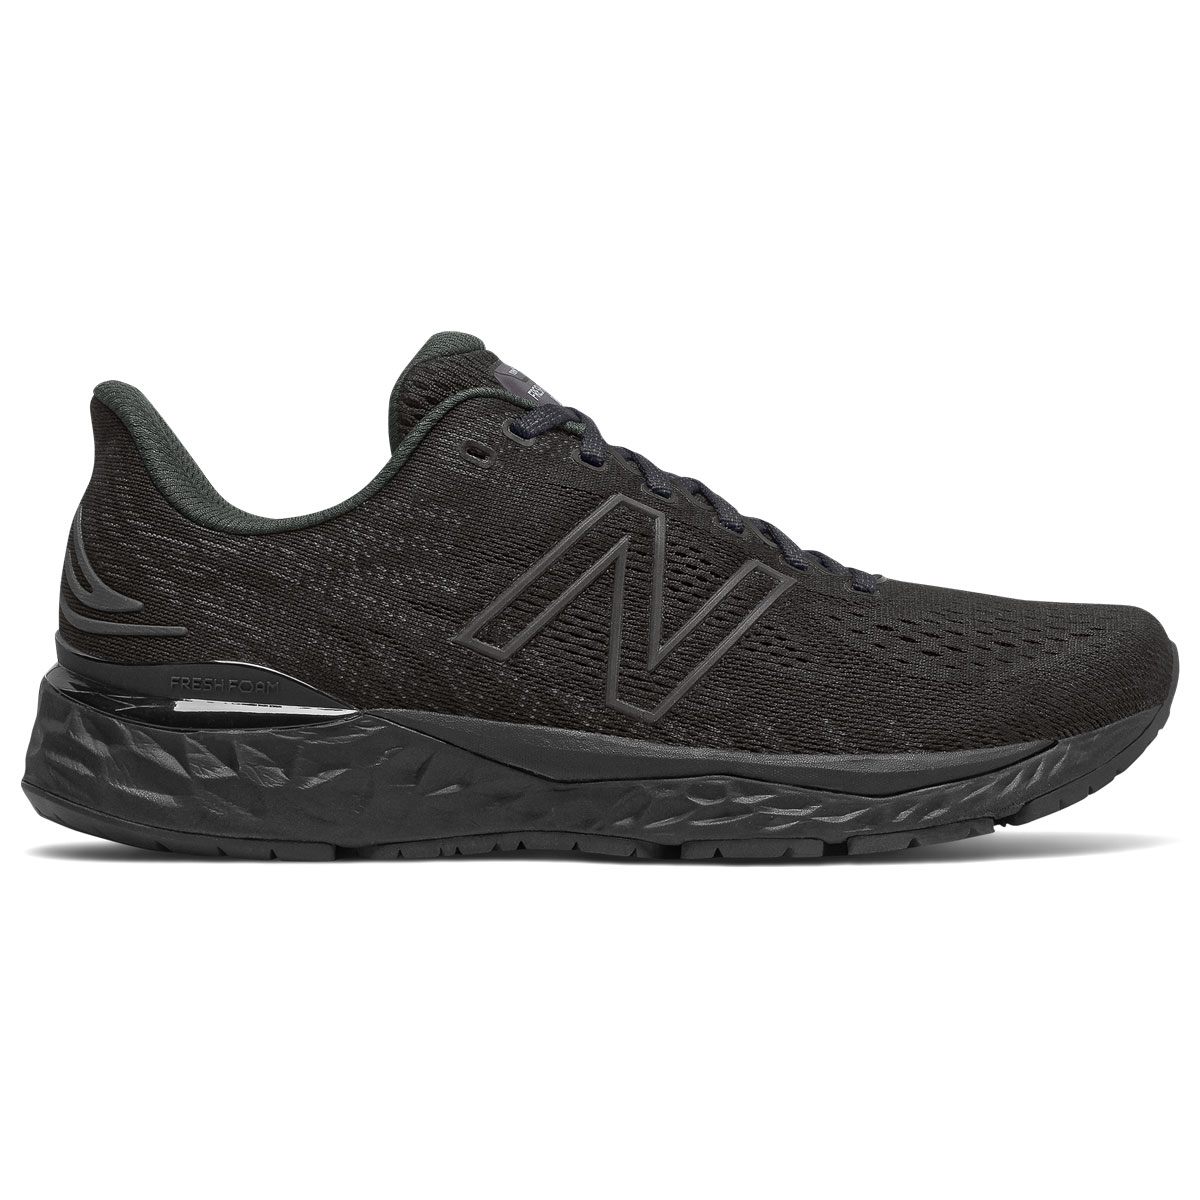 Men's New Balance Fresh Foam 880v11 Running Shoe - Color: Black/Phantom - Size: 6 - Width: Wide, Black/Phantom, large, image 1